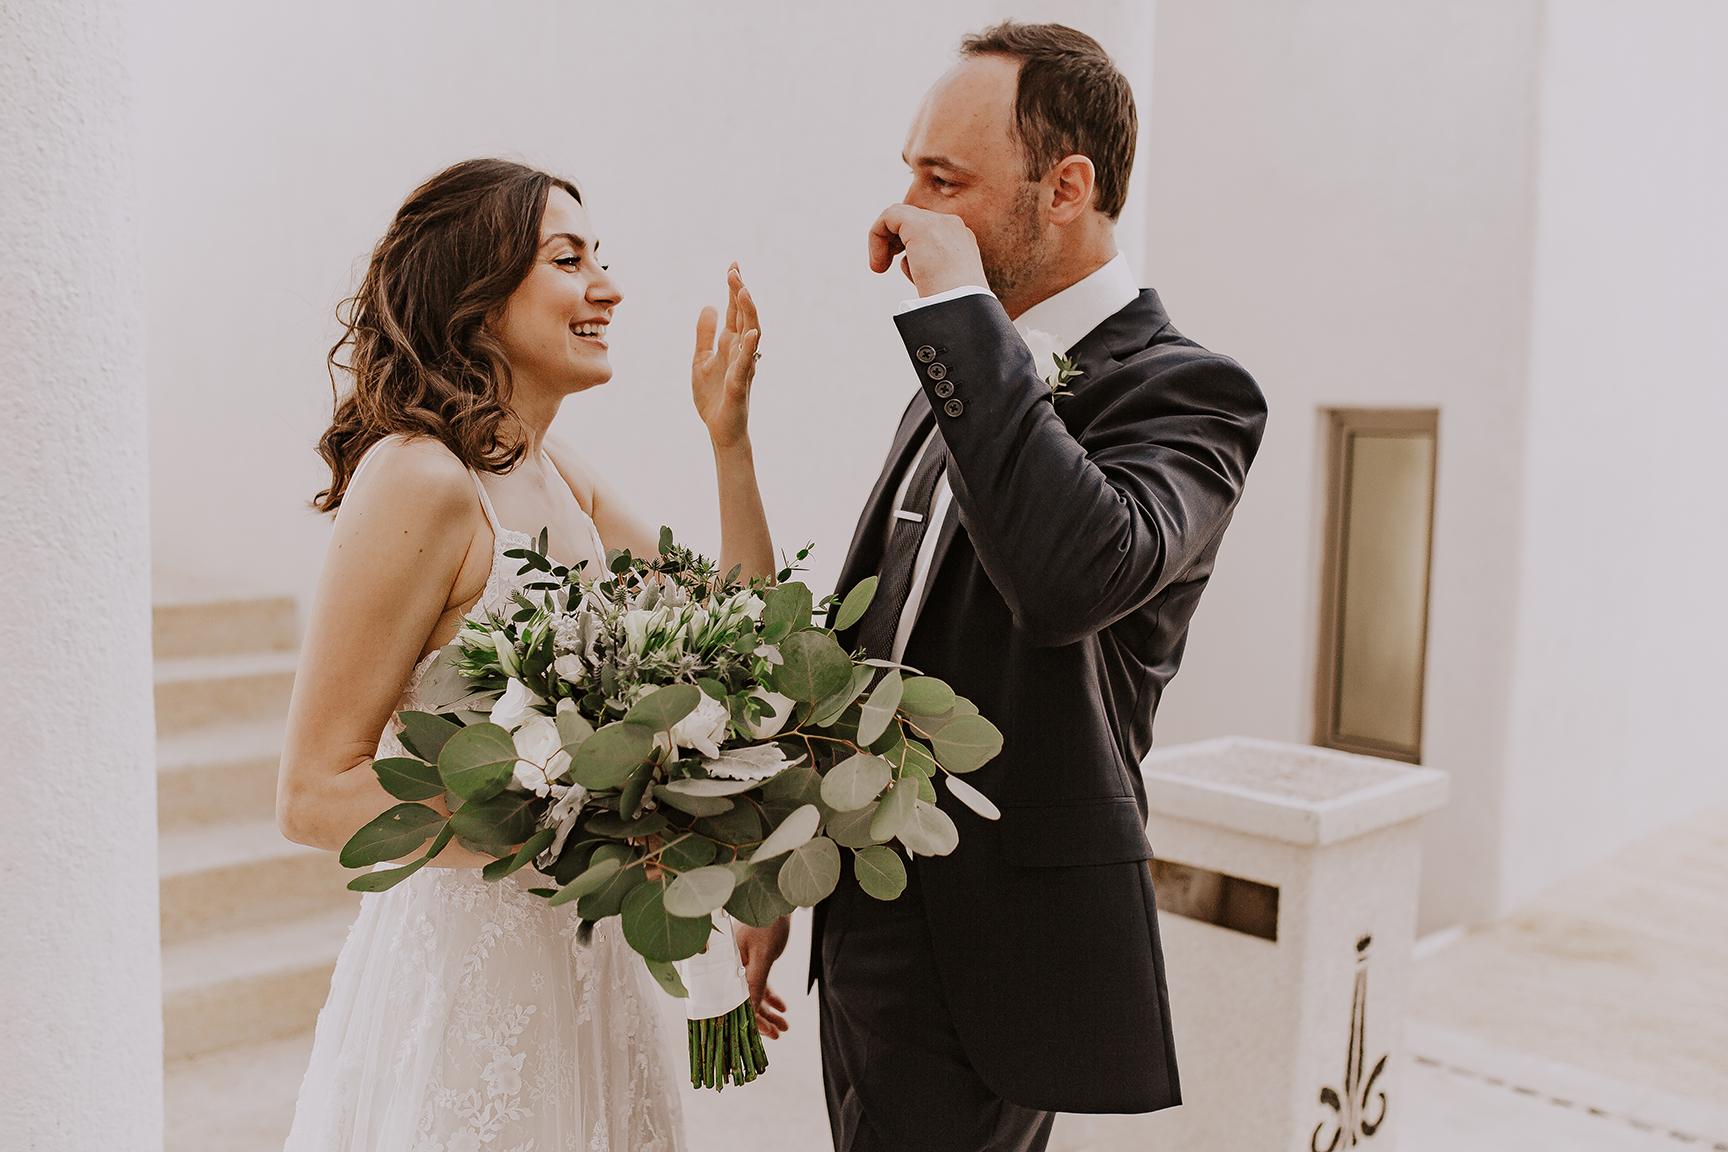 Lindsei+James_cabo_wedding_212.jpg